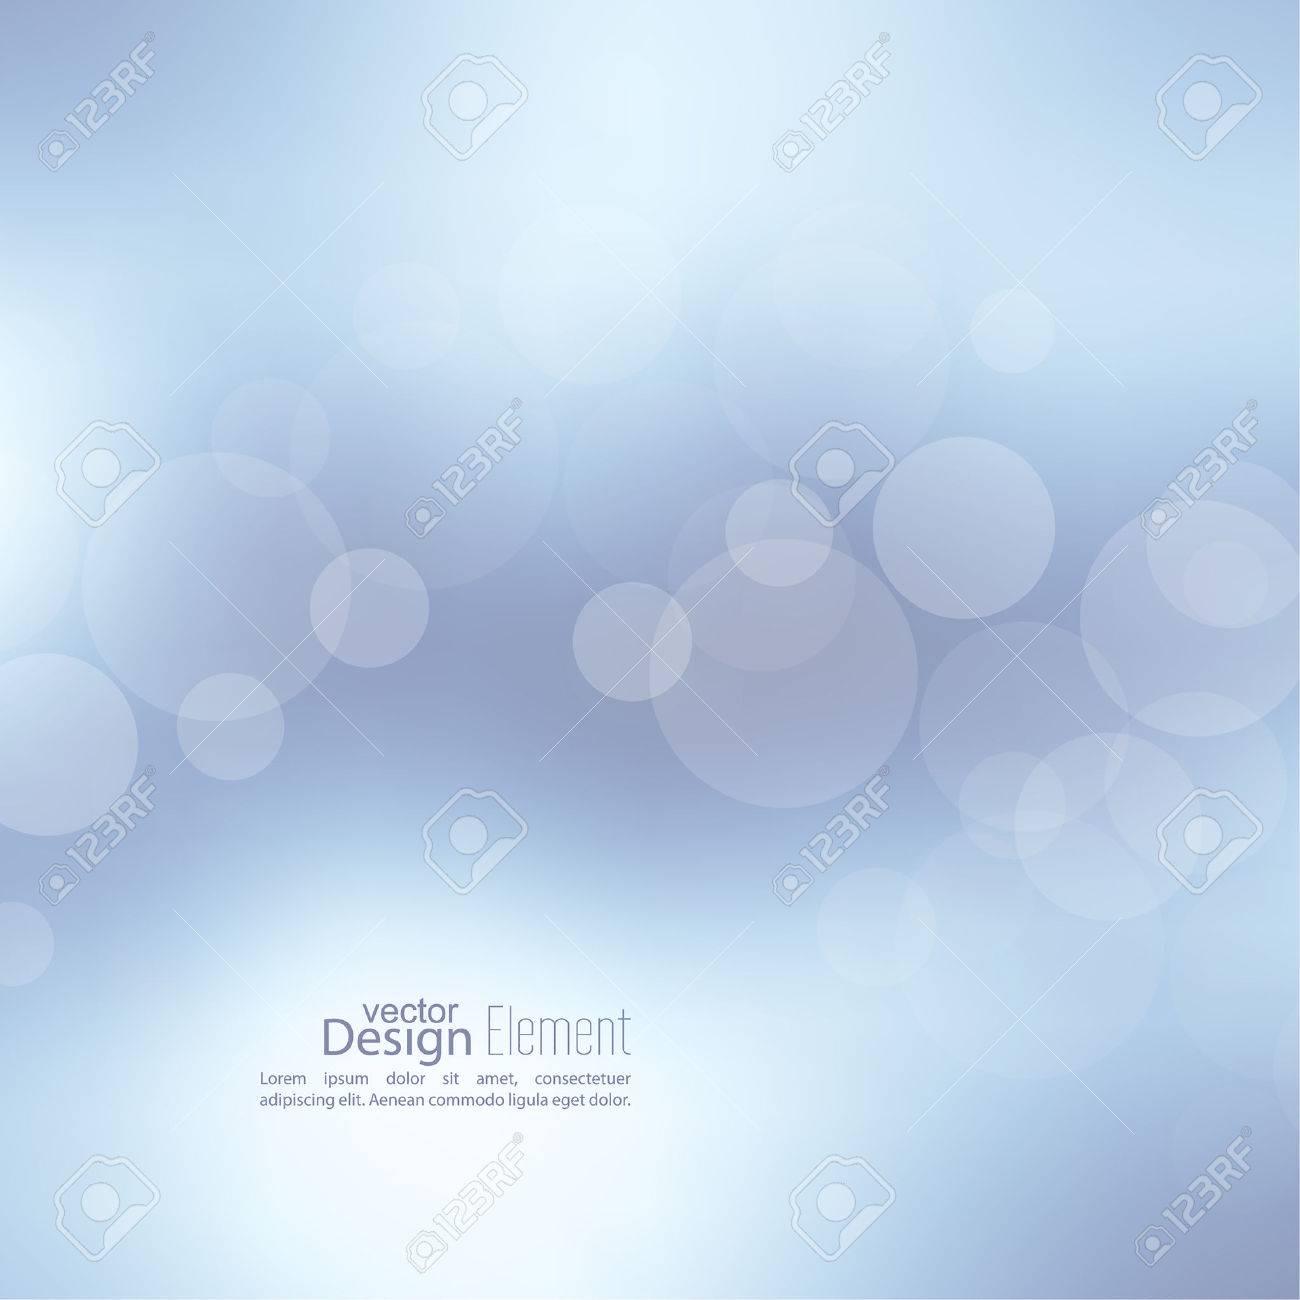 Abstract background with bokeh effect. Vector delicate backdrop. Gentle image blur. Subtle defocused wallpaper. Soft gradient. - 60483825